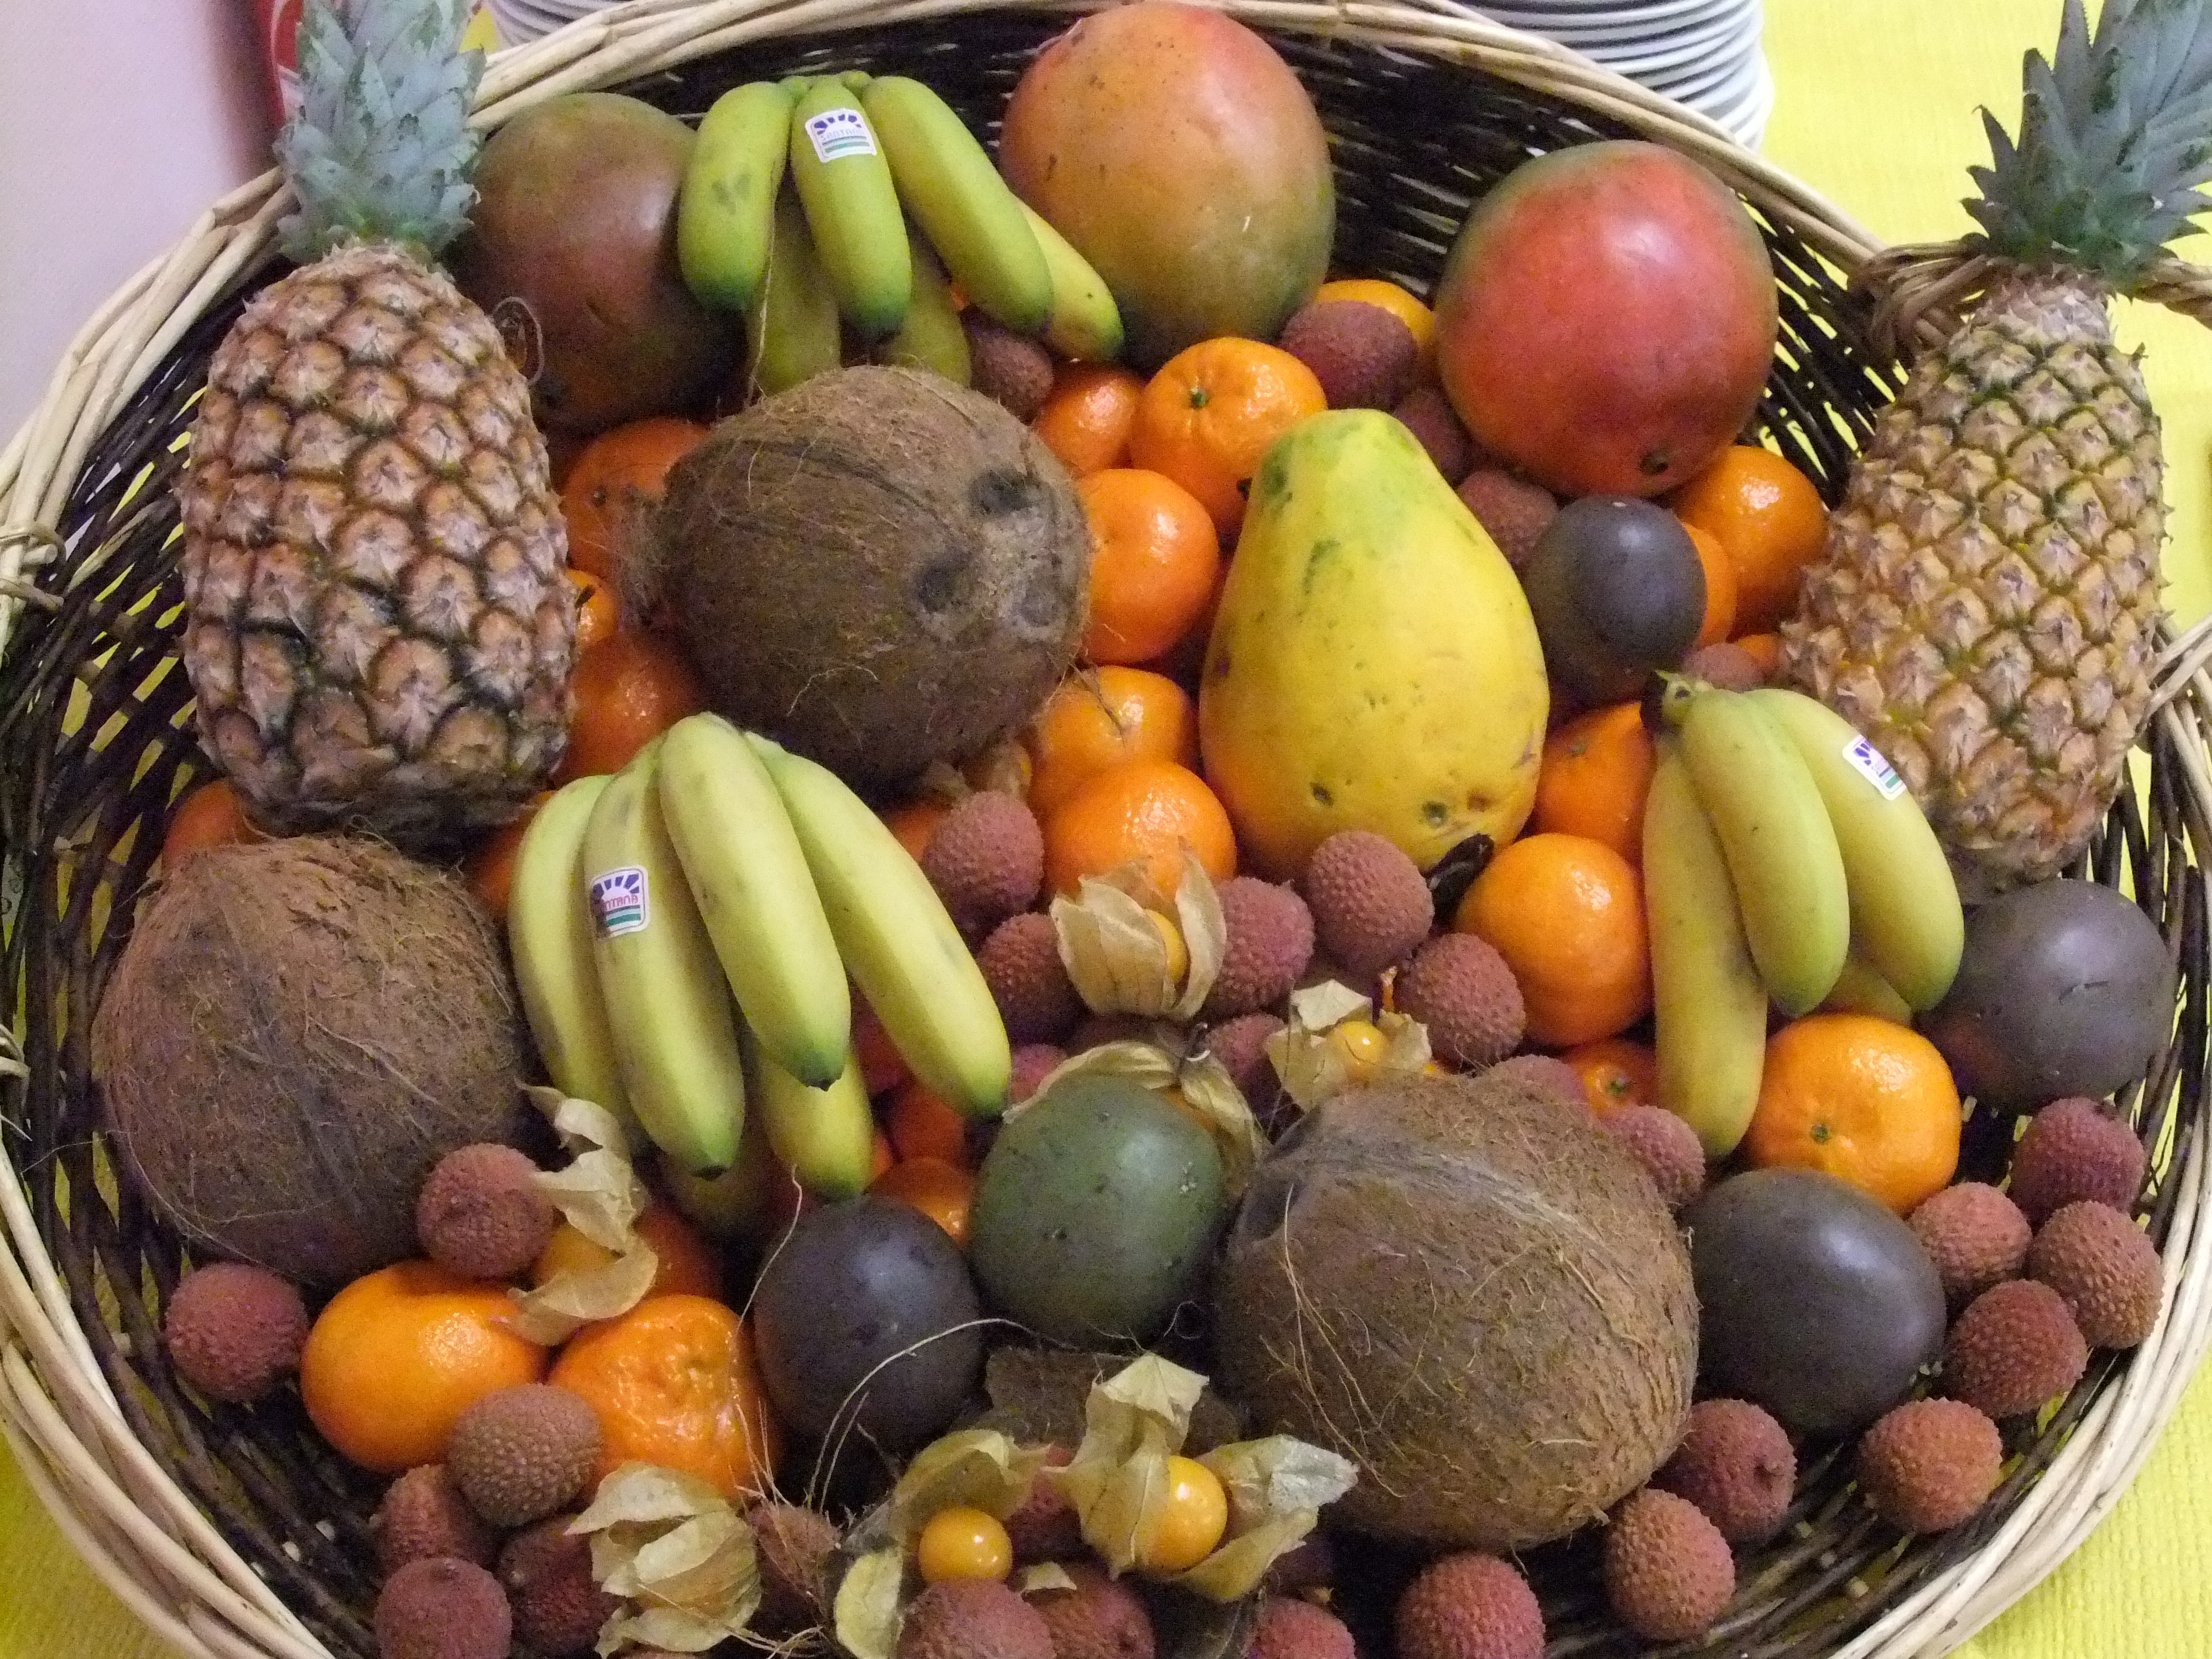 Pin fruits exotiques on pinterest - Image fruit exotique ...